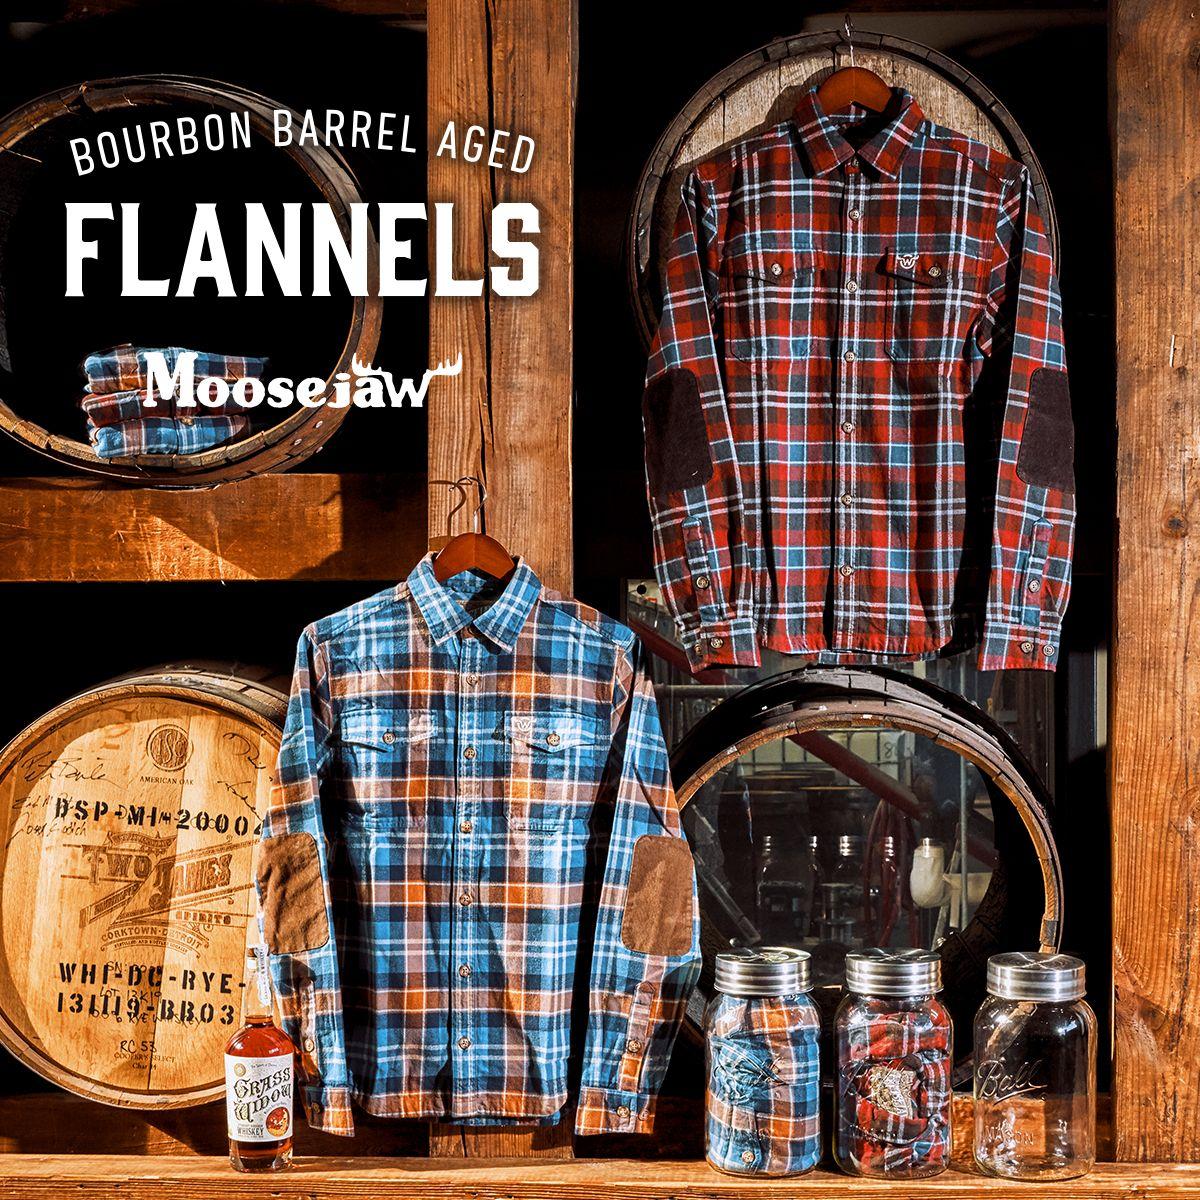 Moosejaw 2019 Bourbon Barrel Aged Flannel Bourbon barrel